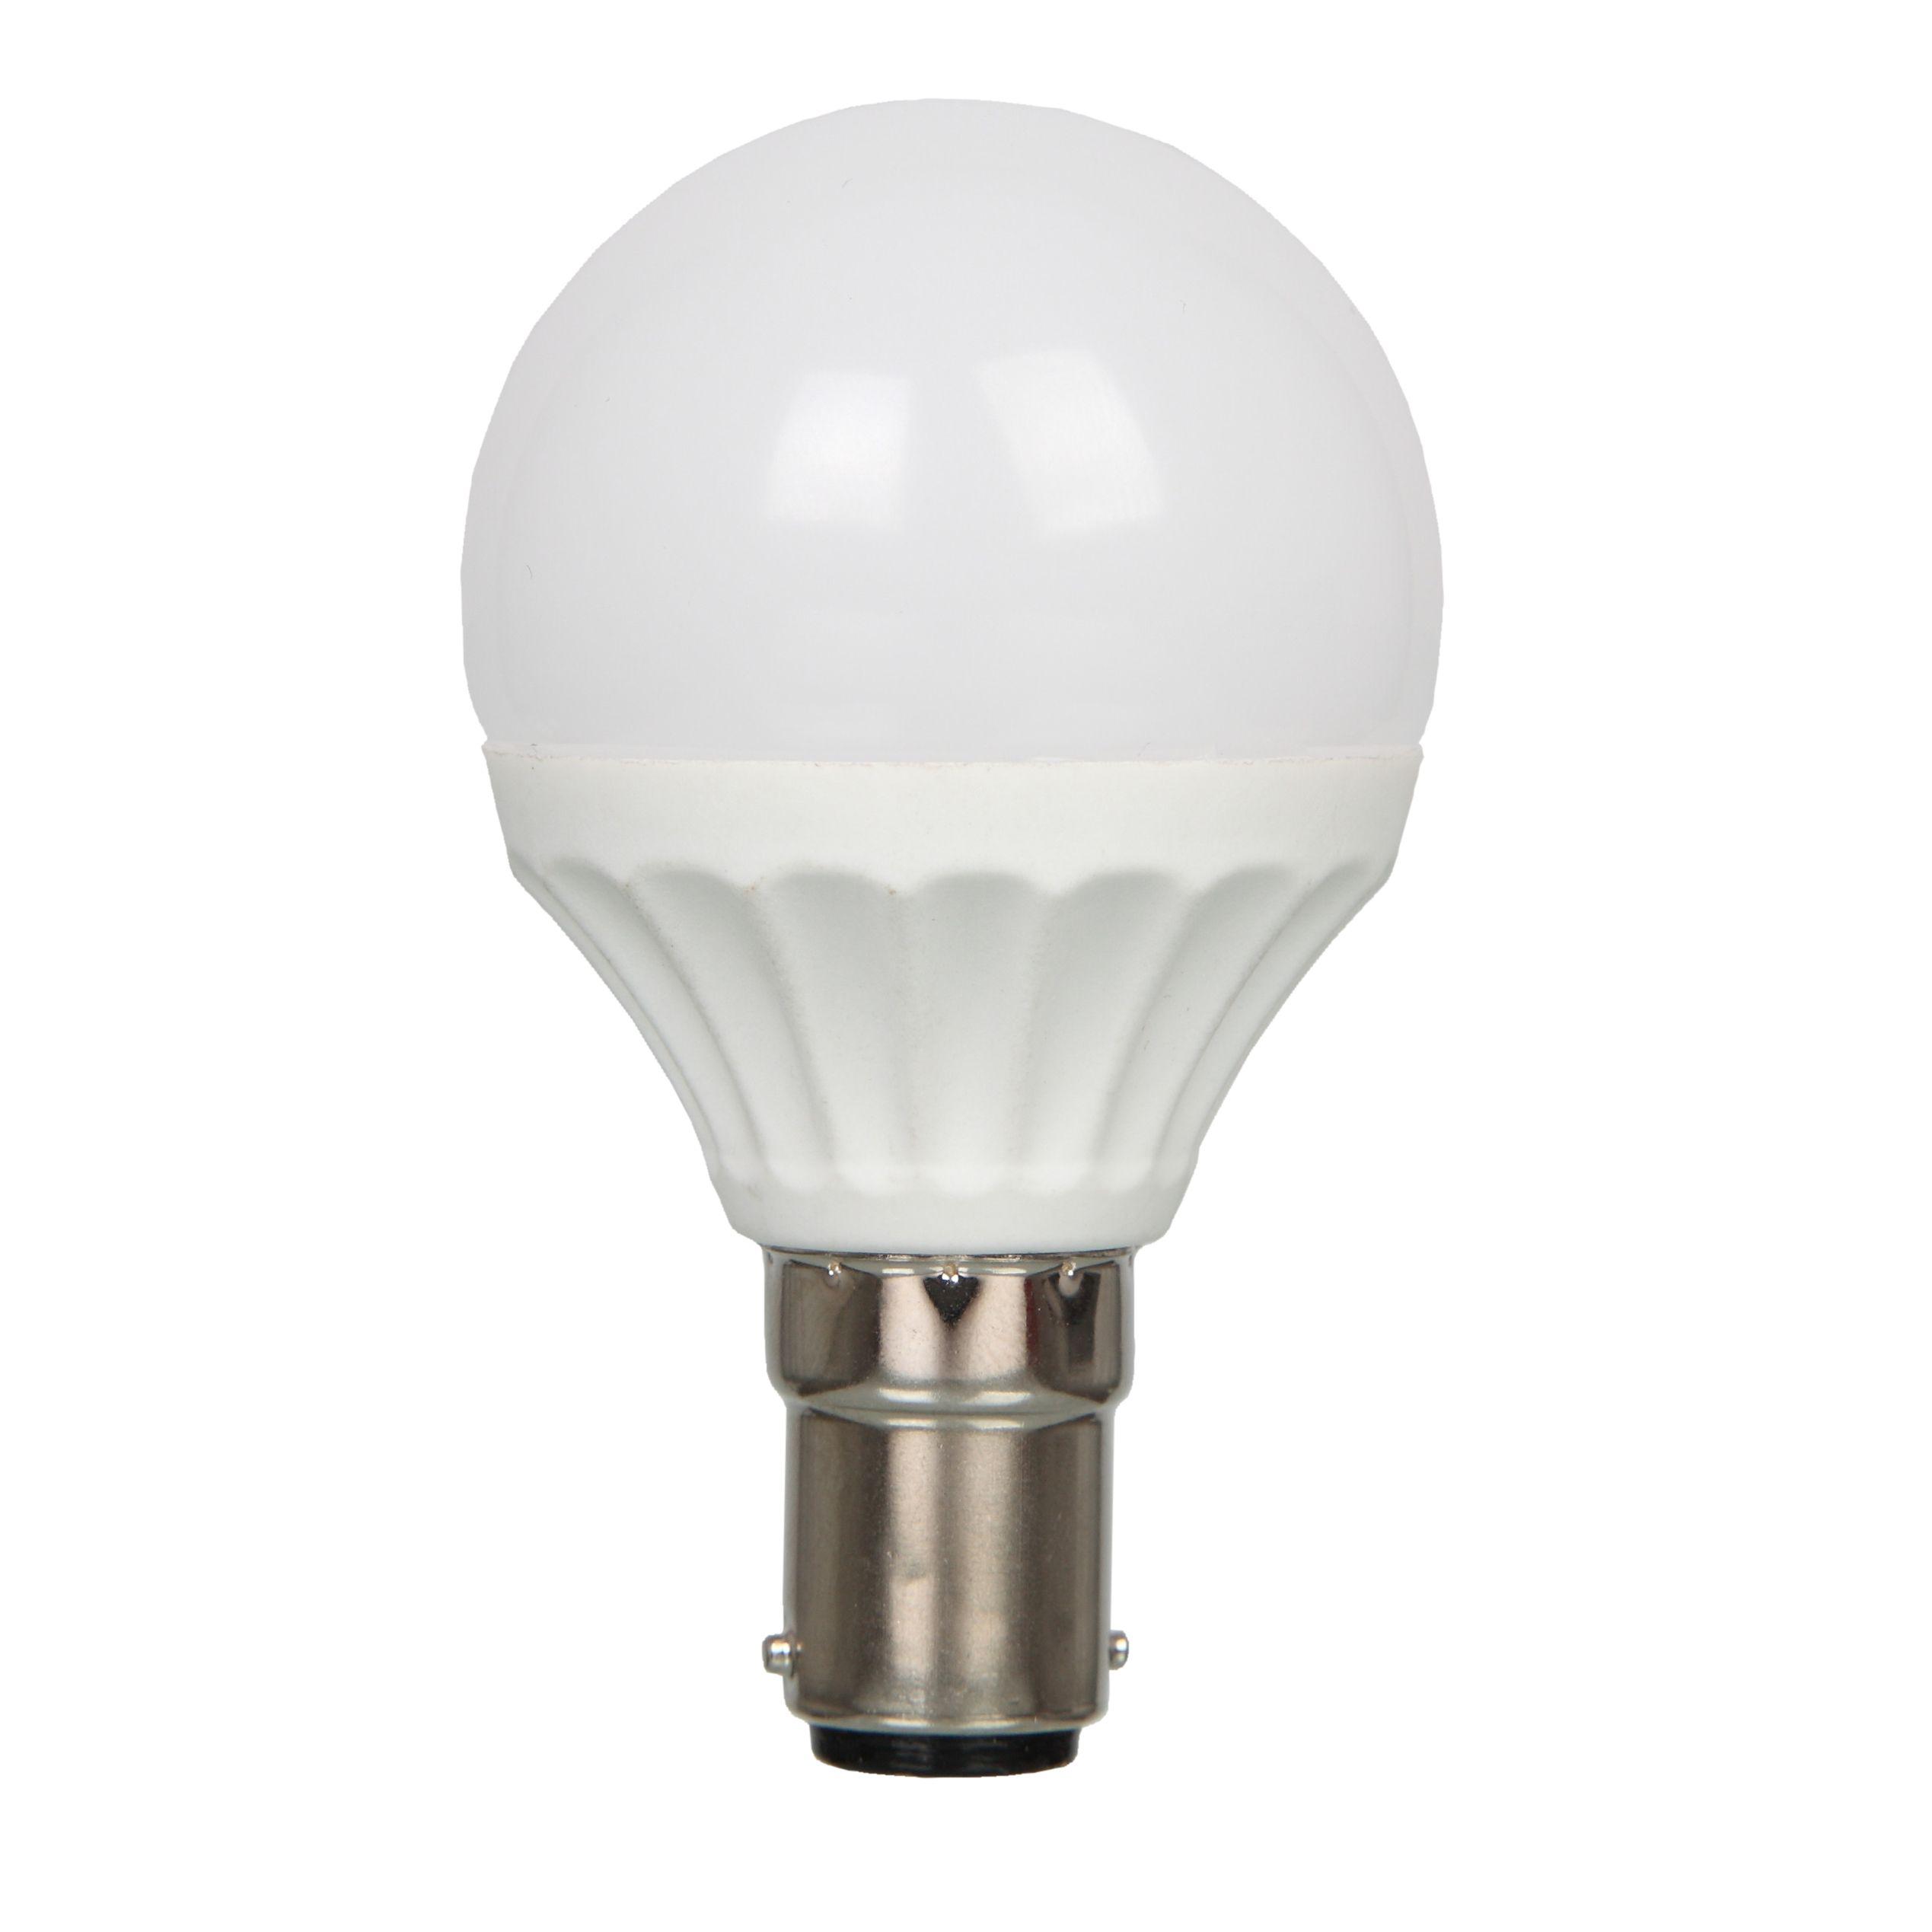 25w round bulb diy. Black Bedroom Furniture Sets. Home Design Ideas